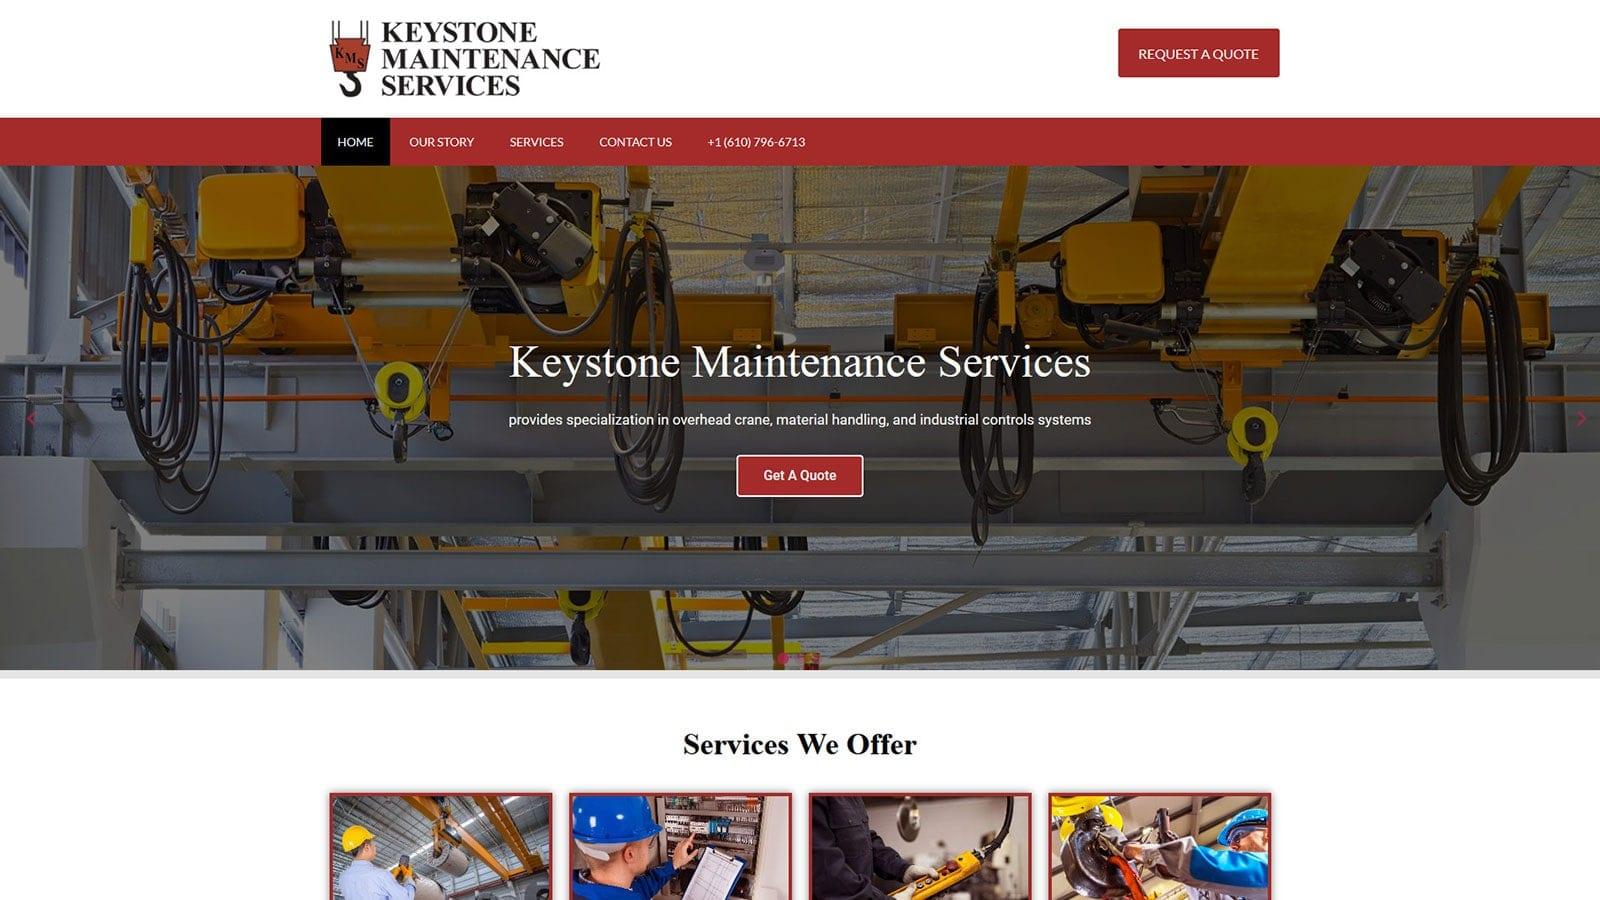 Keystone Maintenance Services Websites